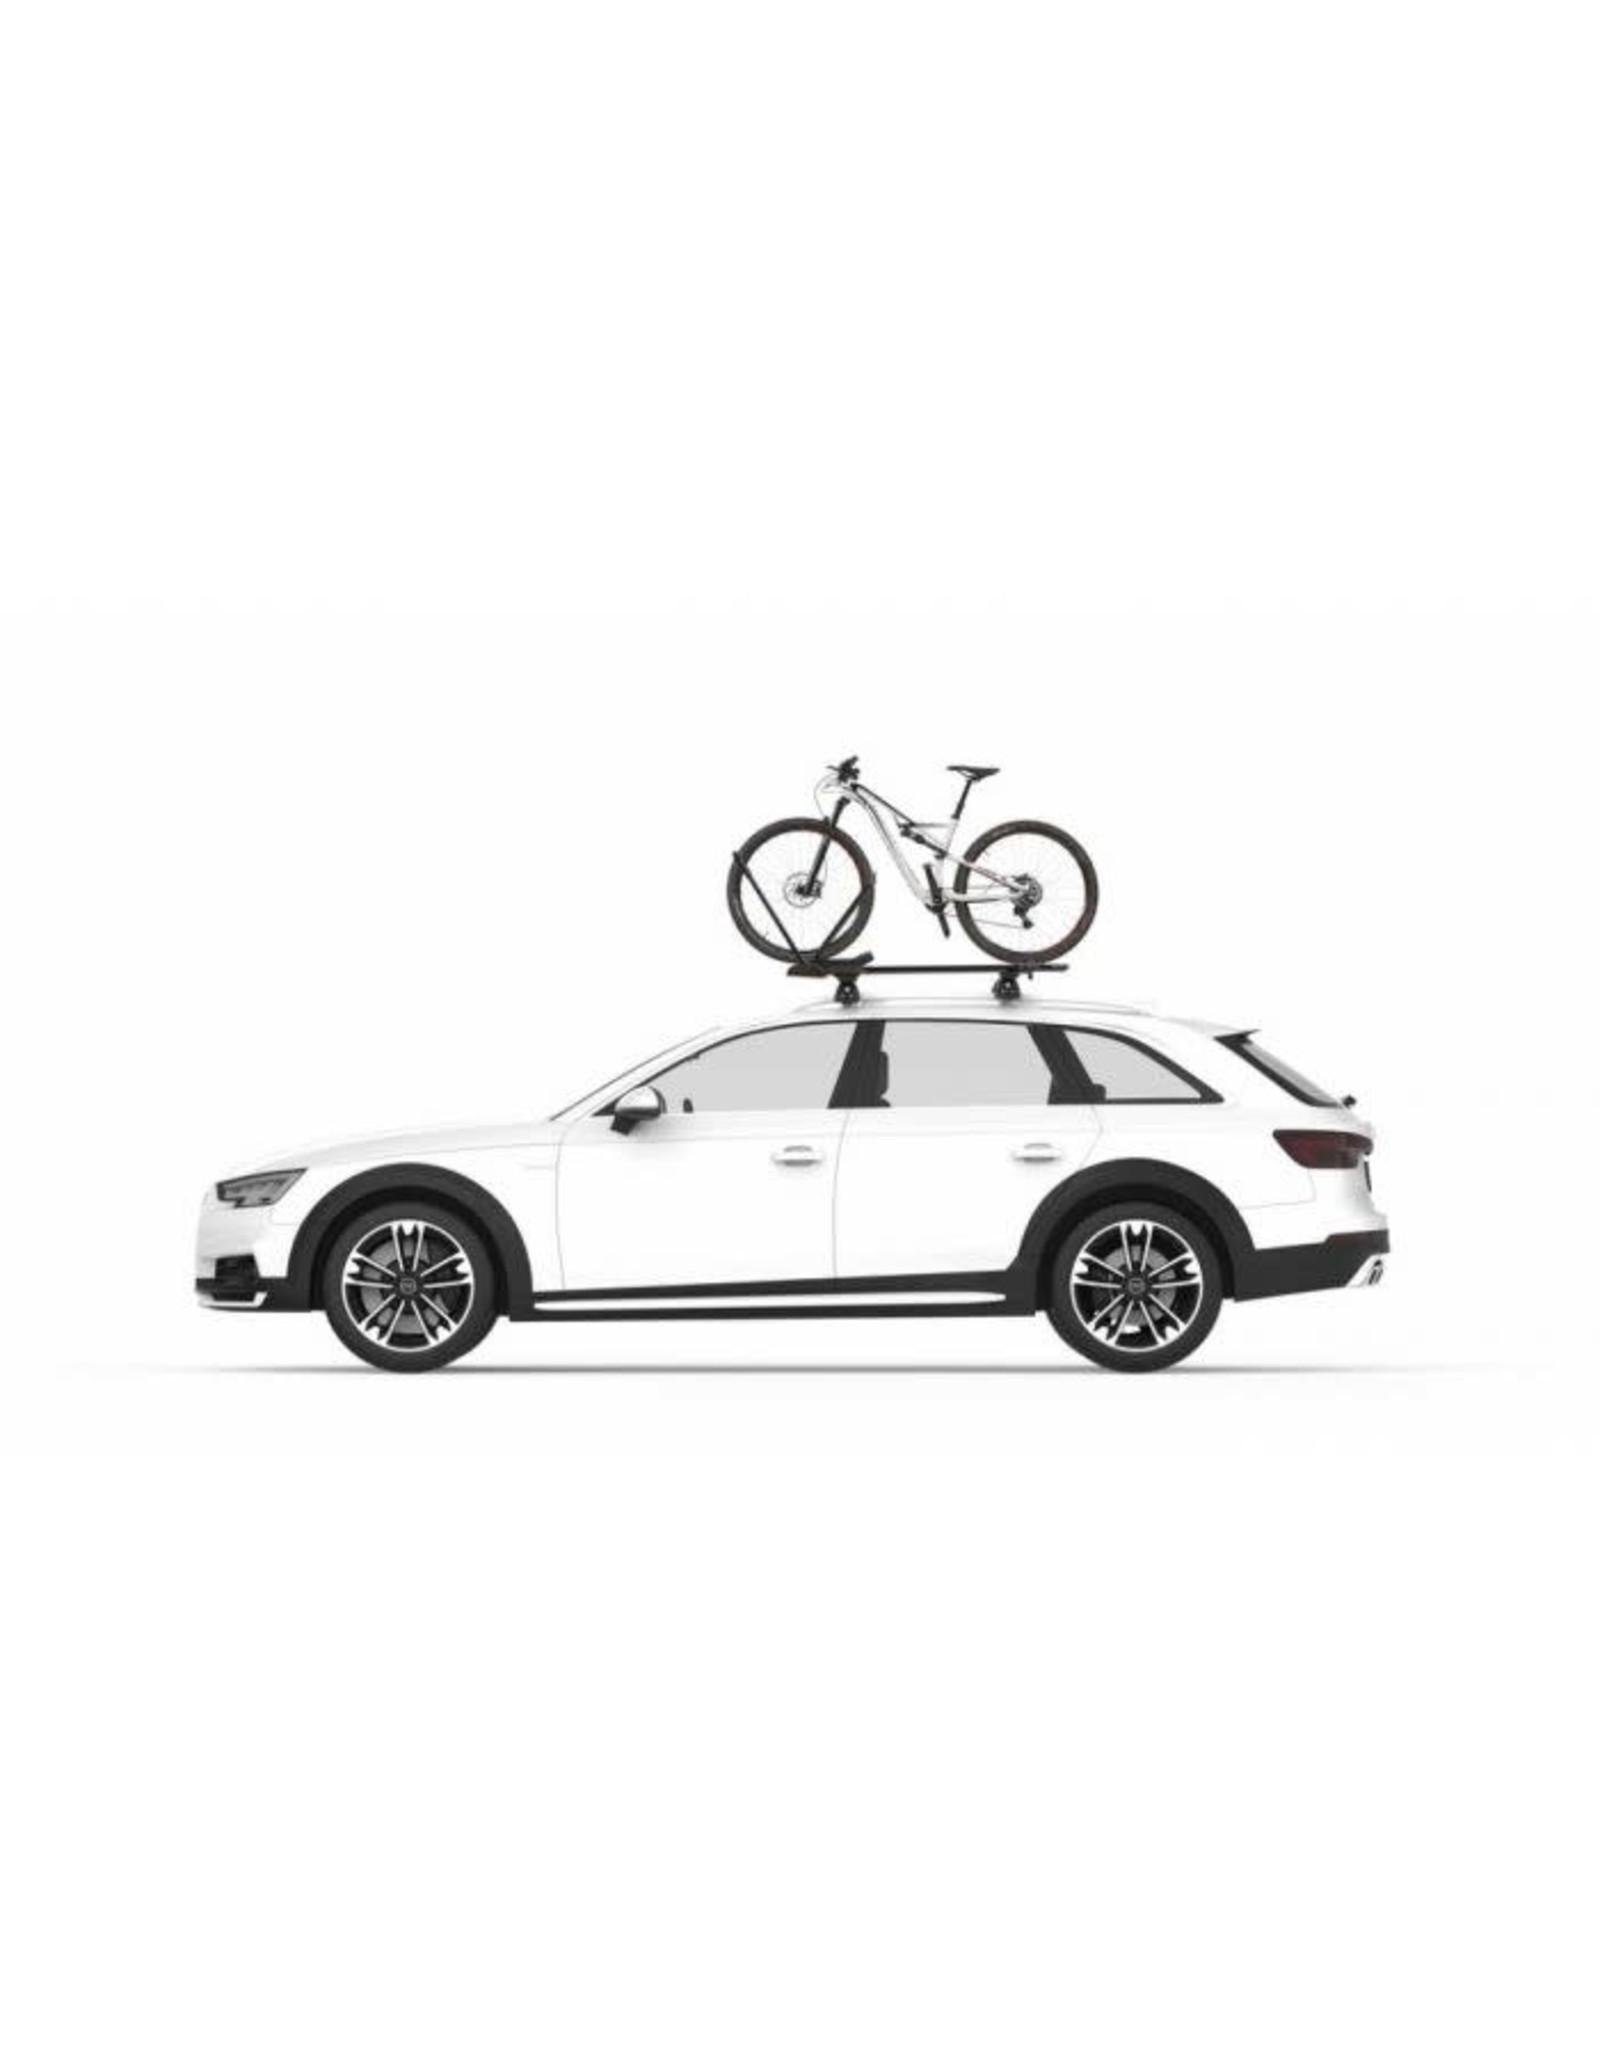 YAKIMA YAKIMA HIGH ROAD CAR RACK (SUIT ROOF RACKS)